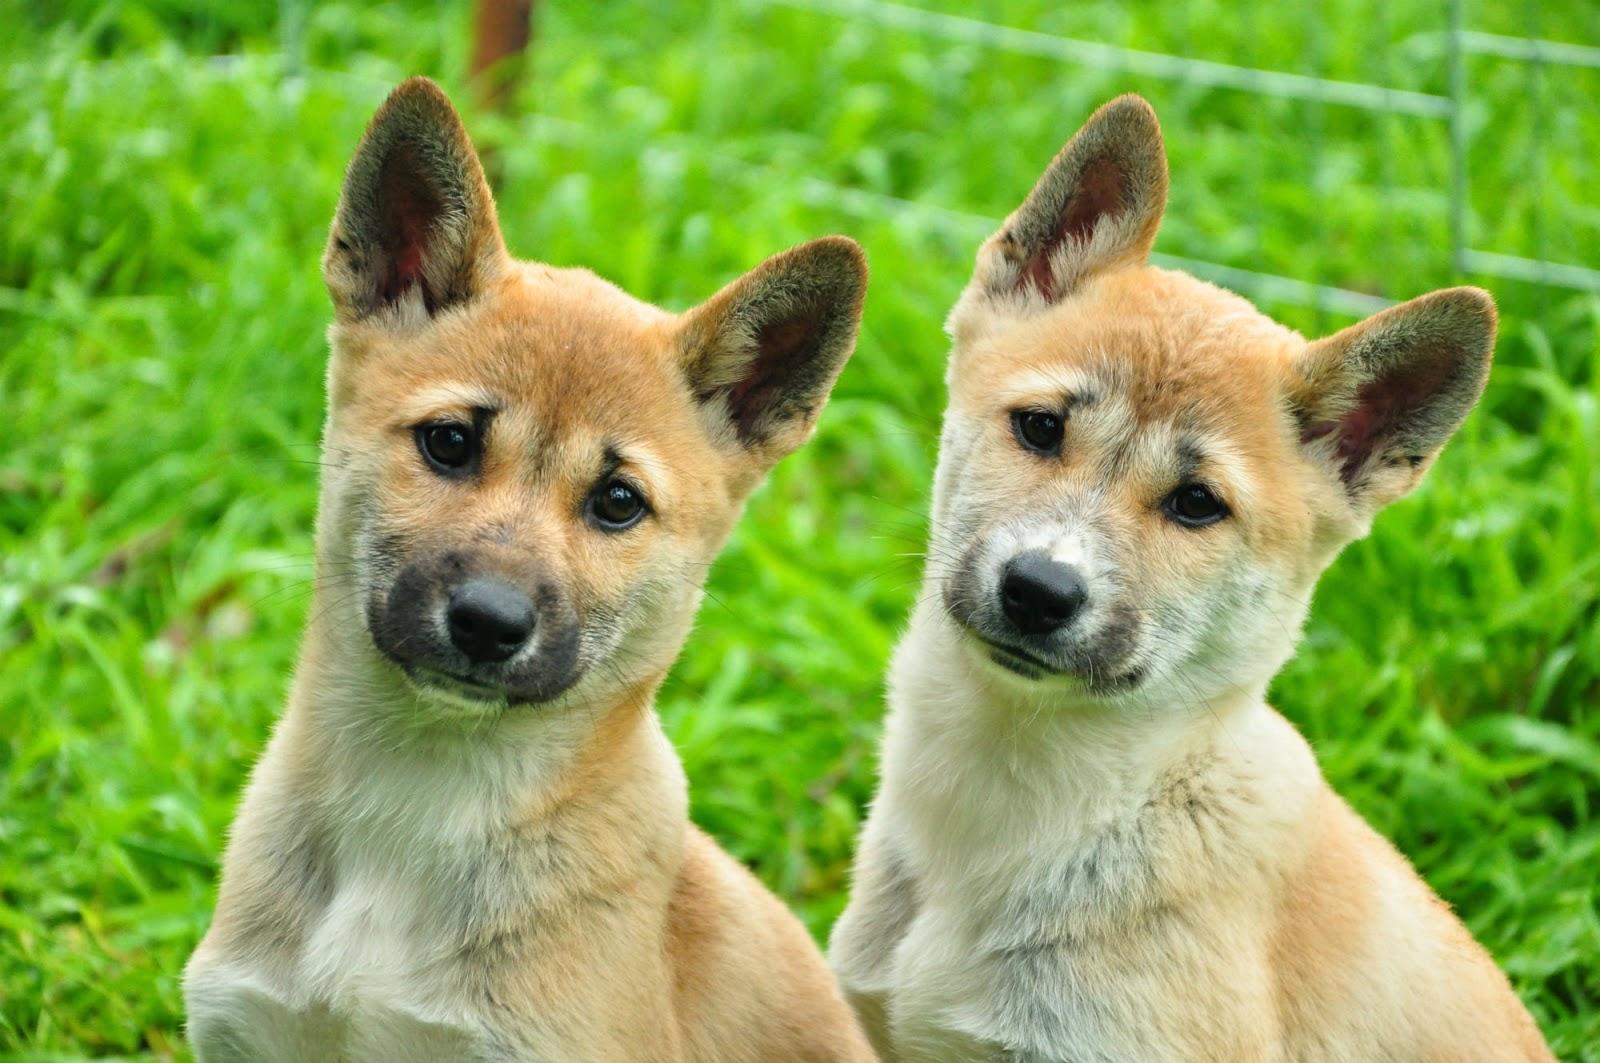 Dingo puppies cute - photo#1